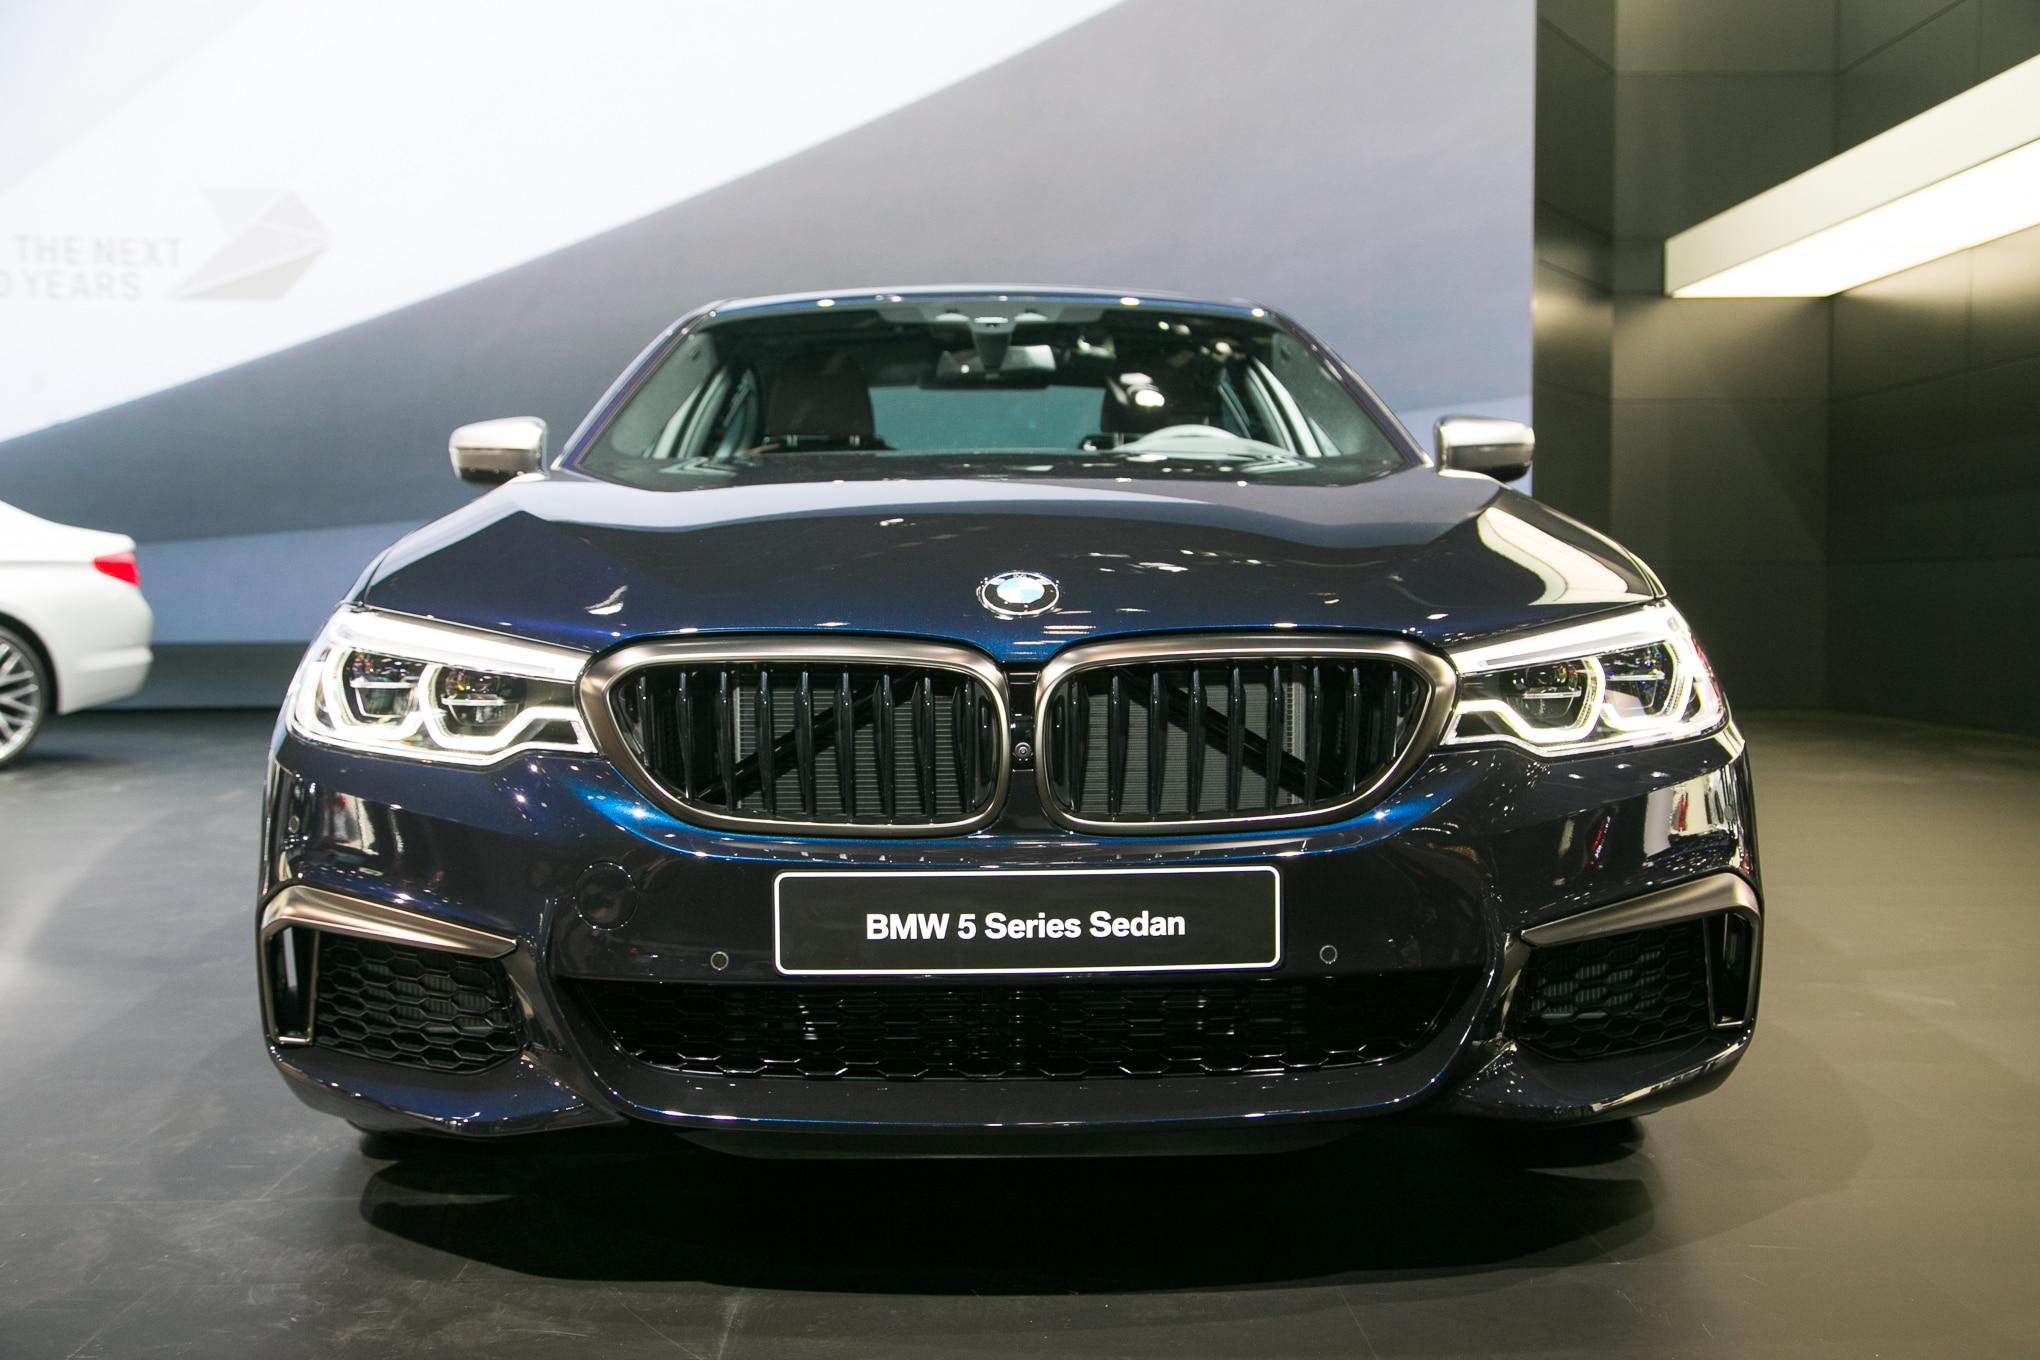 2018 BMW M550i XDrive Front View